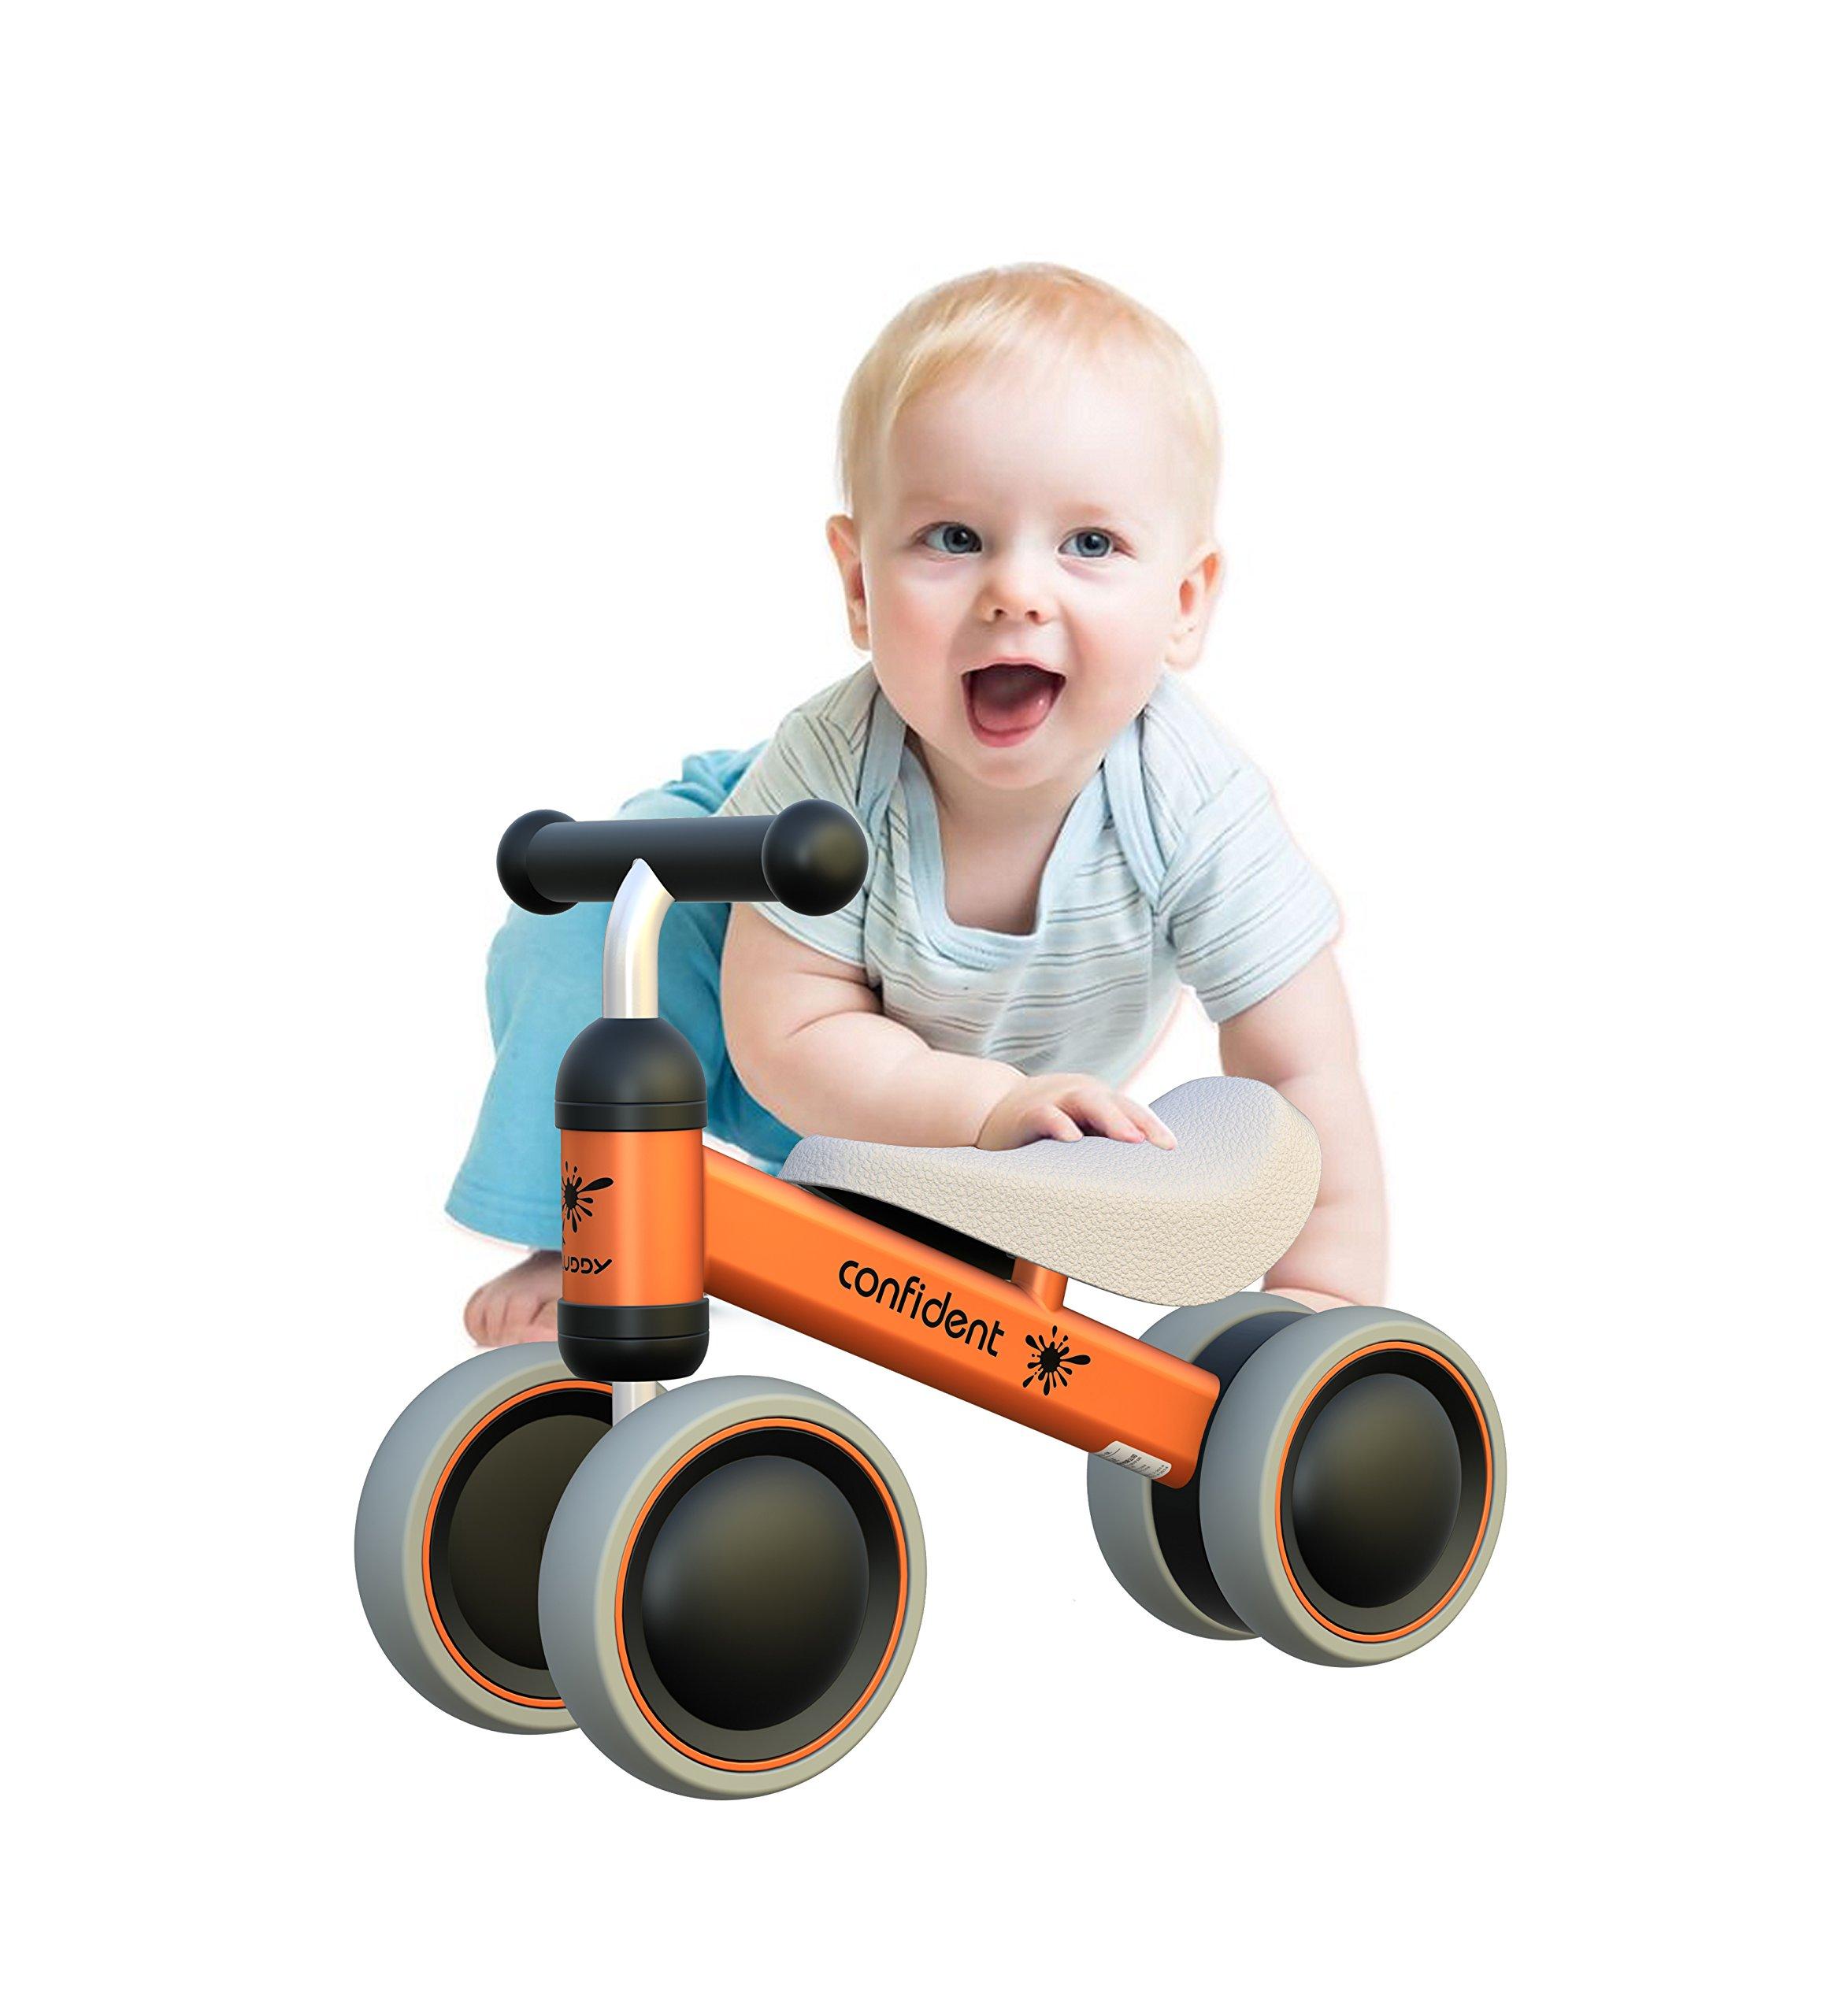 YGJT Baby Balance Bikes Bicycle Baby Walker Toys Rides 1 Year Boys Girls 10 Months-24 Months Baby's First Bike First Birthday Gift Orange